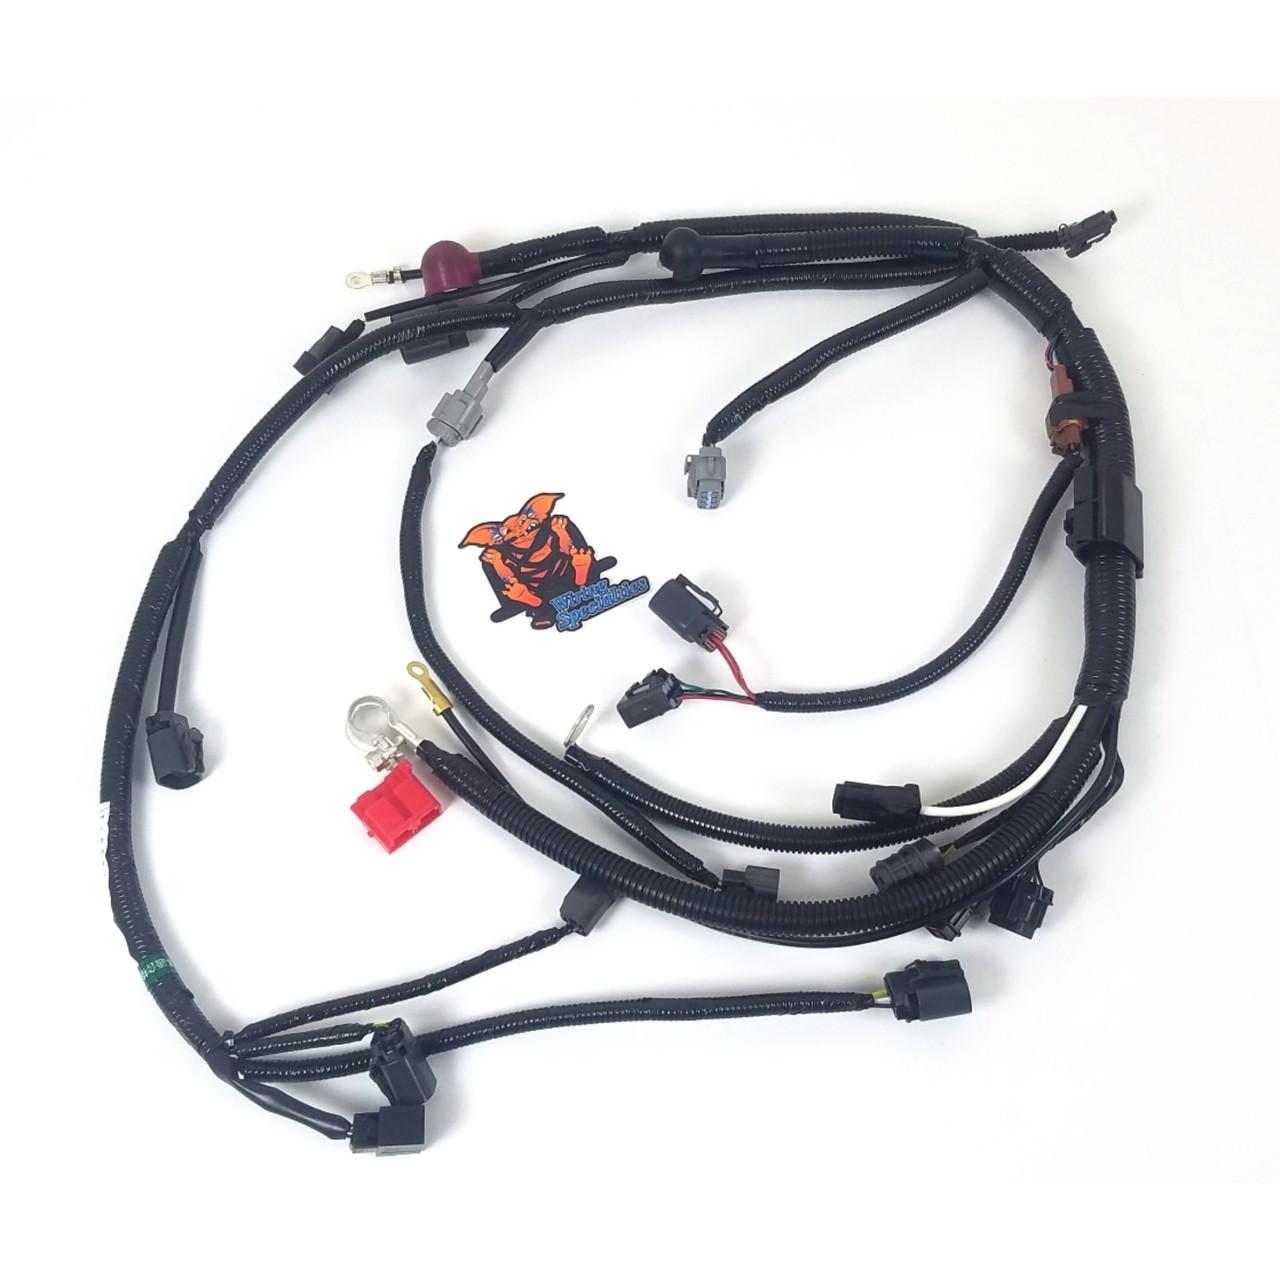 ka24de swap wiring harness wiring diagrams b16a motor jdm b16a wiring harness [ 1280 x 1280 Pixel ]